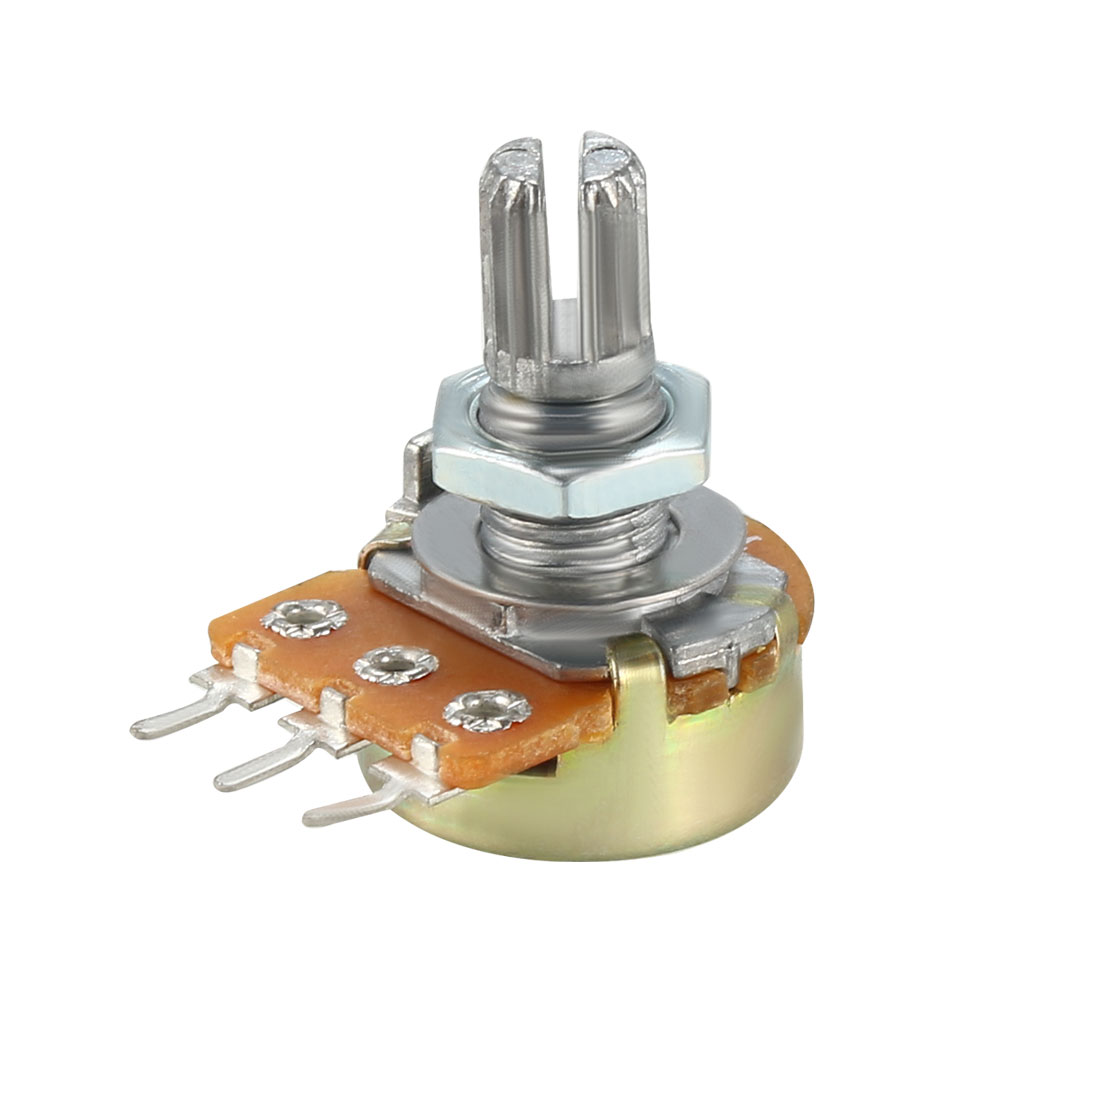 WH148 Potentiometer Variable Resistors Single Turn Rotary Carbon Film 18pcs